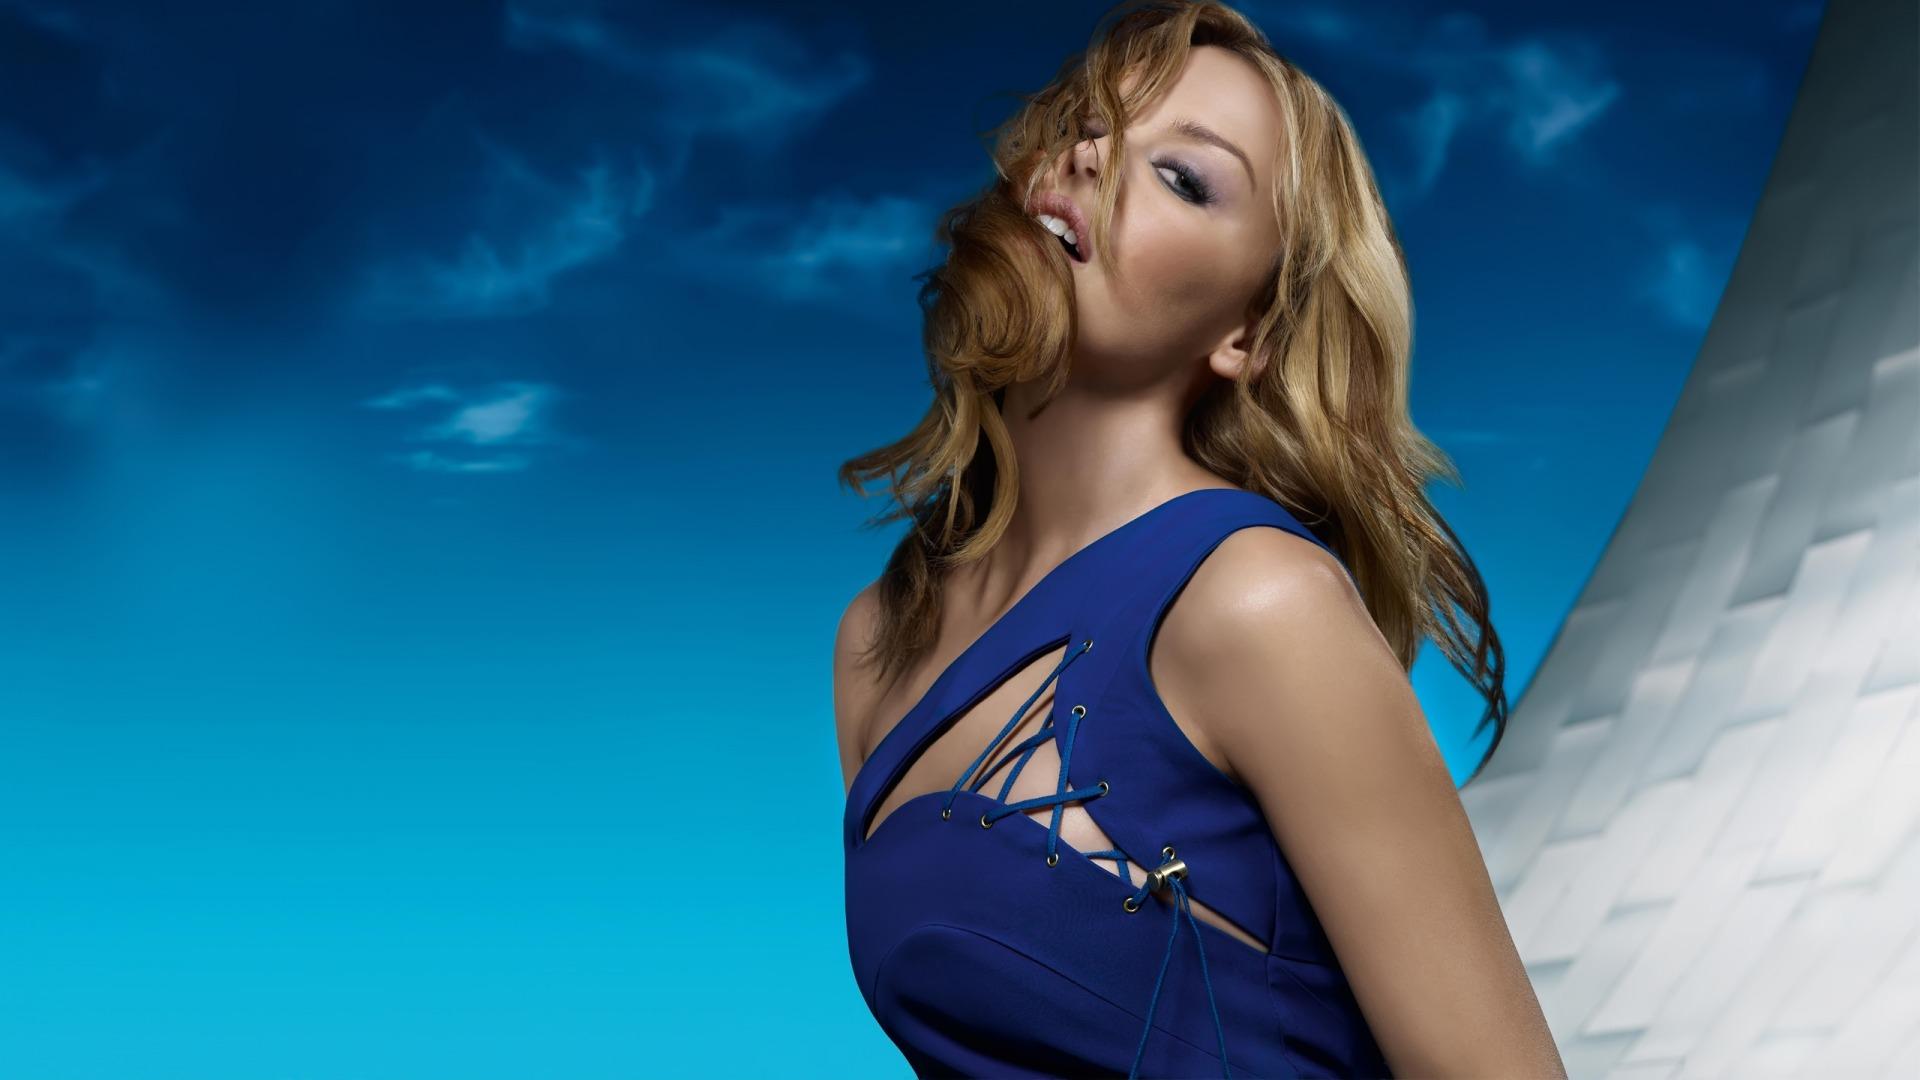 Kylie Minogue Wallpaper